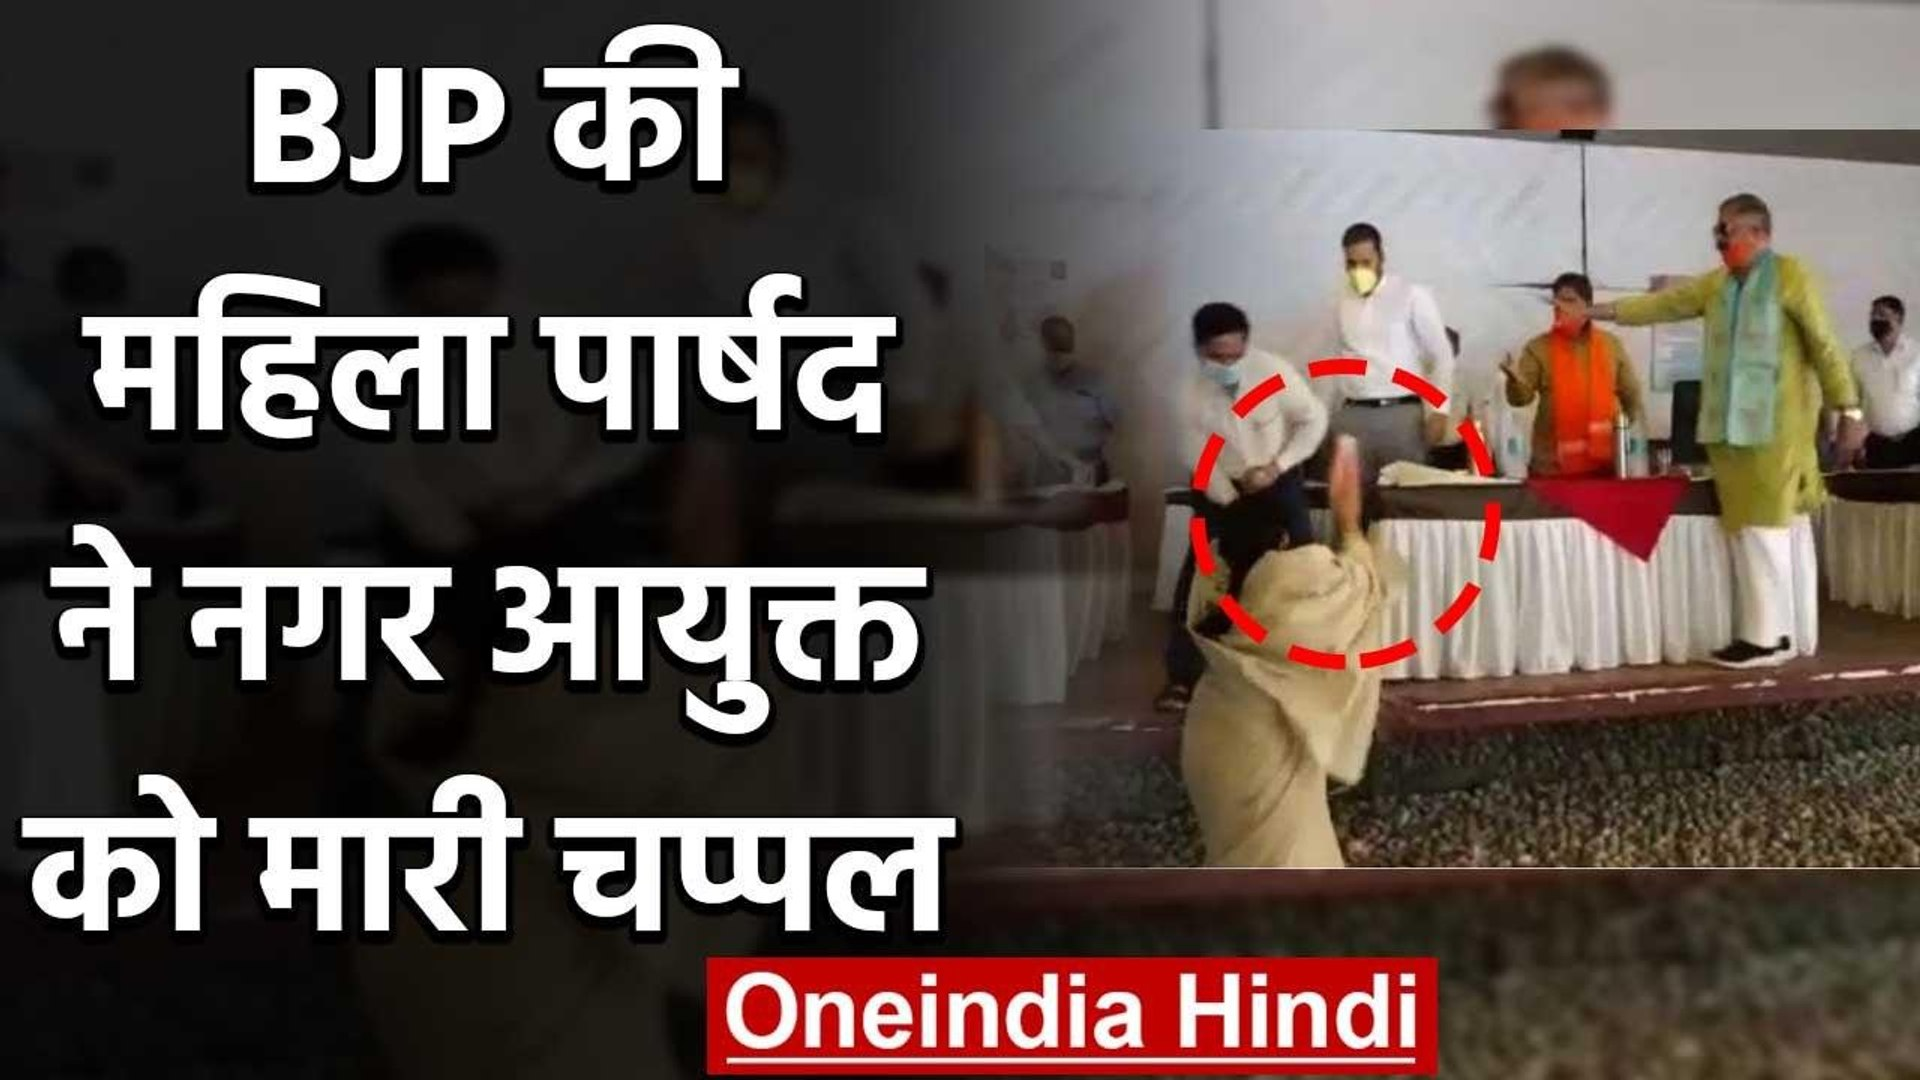 Mathura BJP councilor deepika Rani Singh ने नगर आयुक्त को मारी चप्पल | वनइंडिया हिंदी